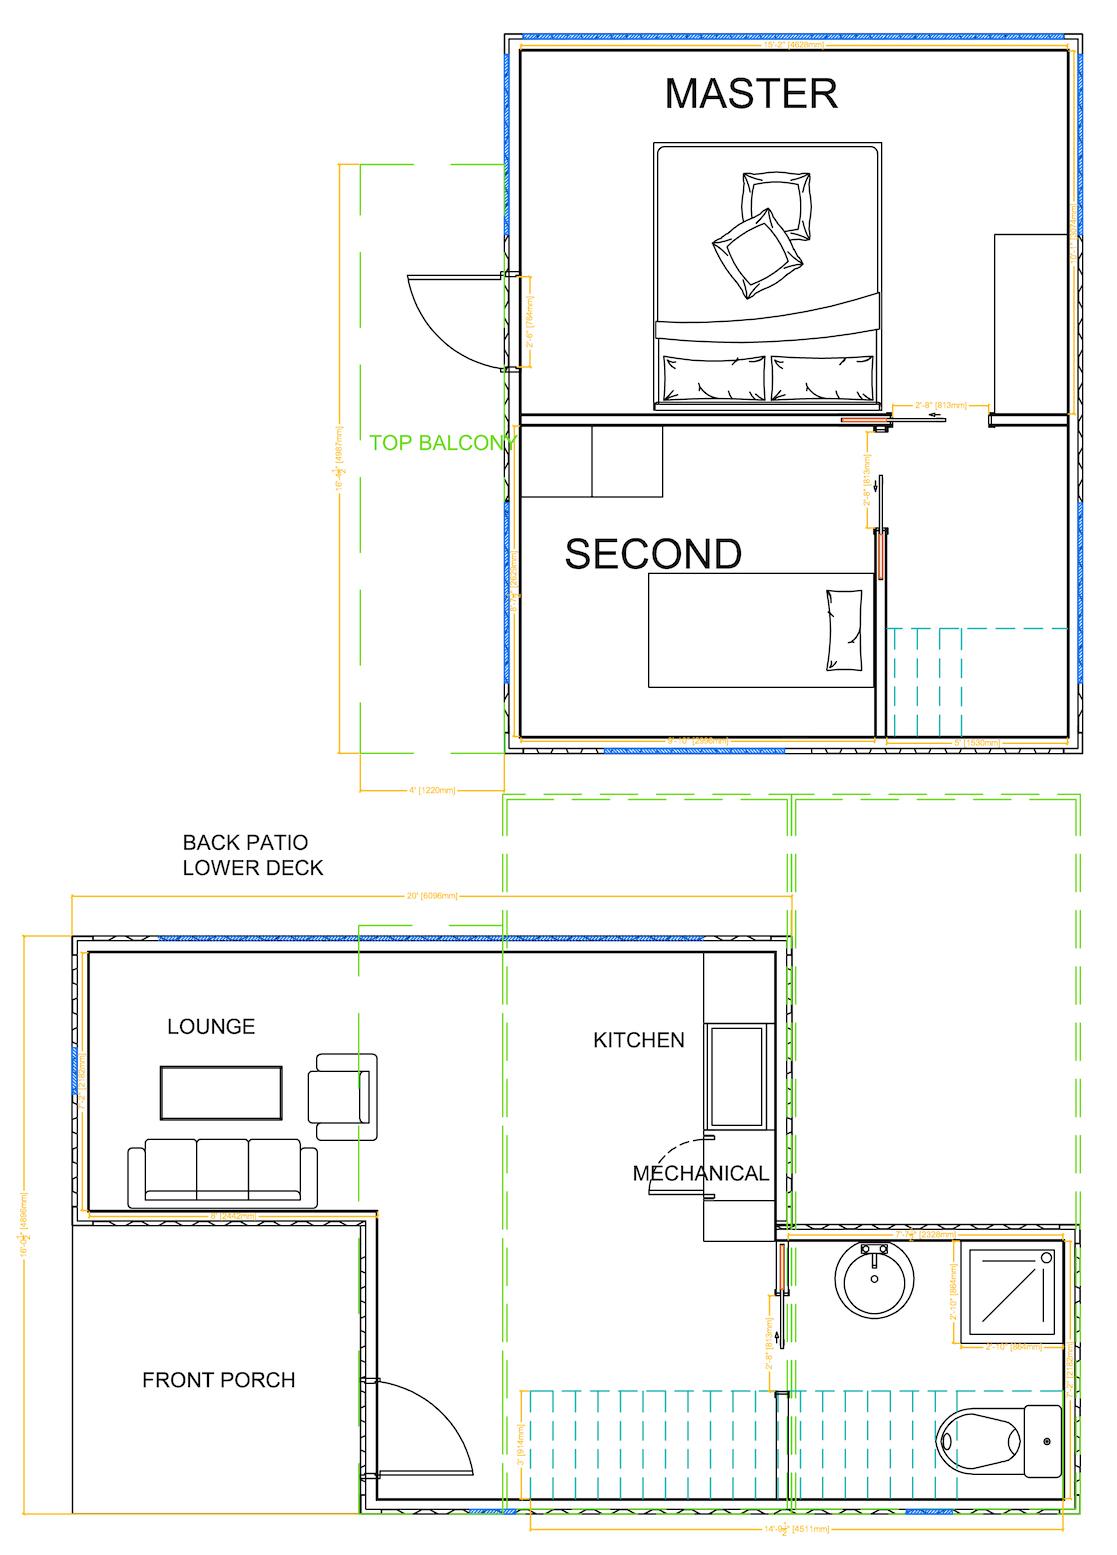 K:\Work Files\Clients\Ballance Homes\Container Homes\DD640\Temp\A2-DD640 11×17 (1)